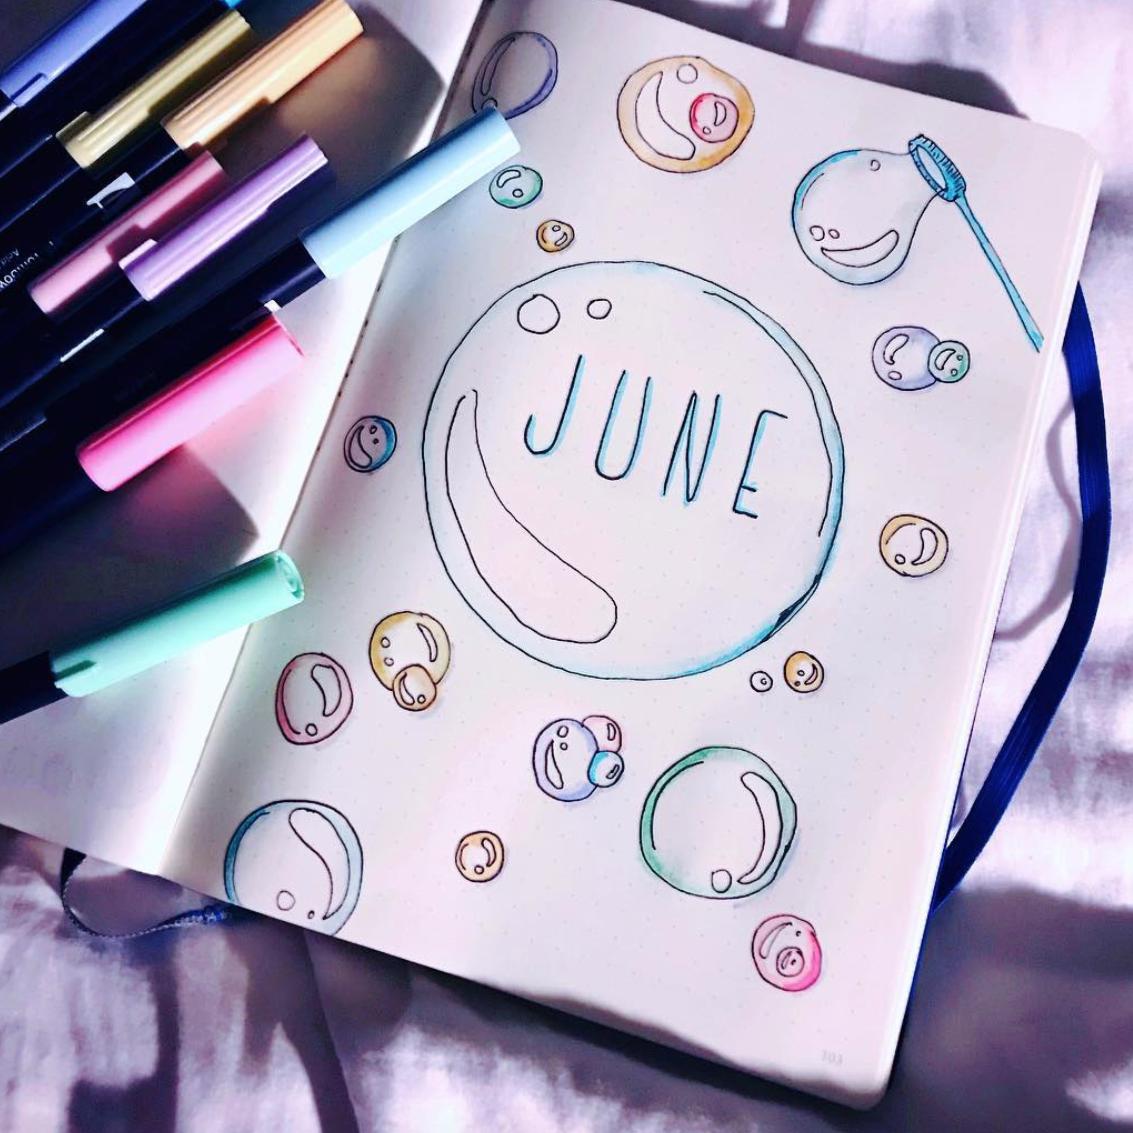 Inspiring Bullet Journal Layouts for June